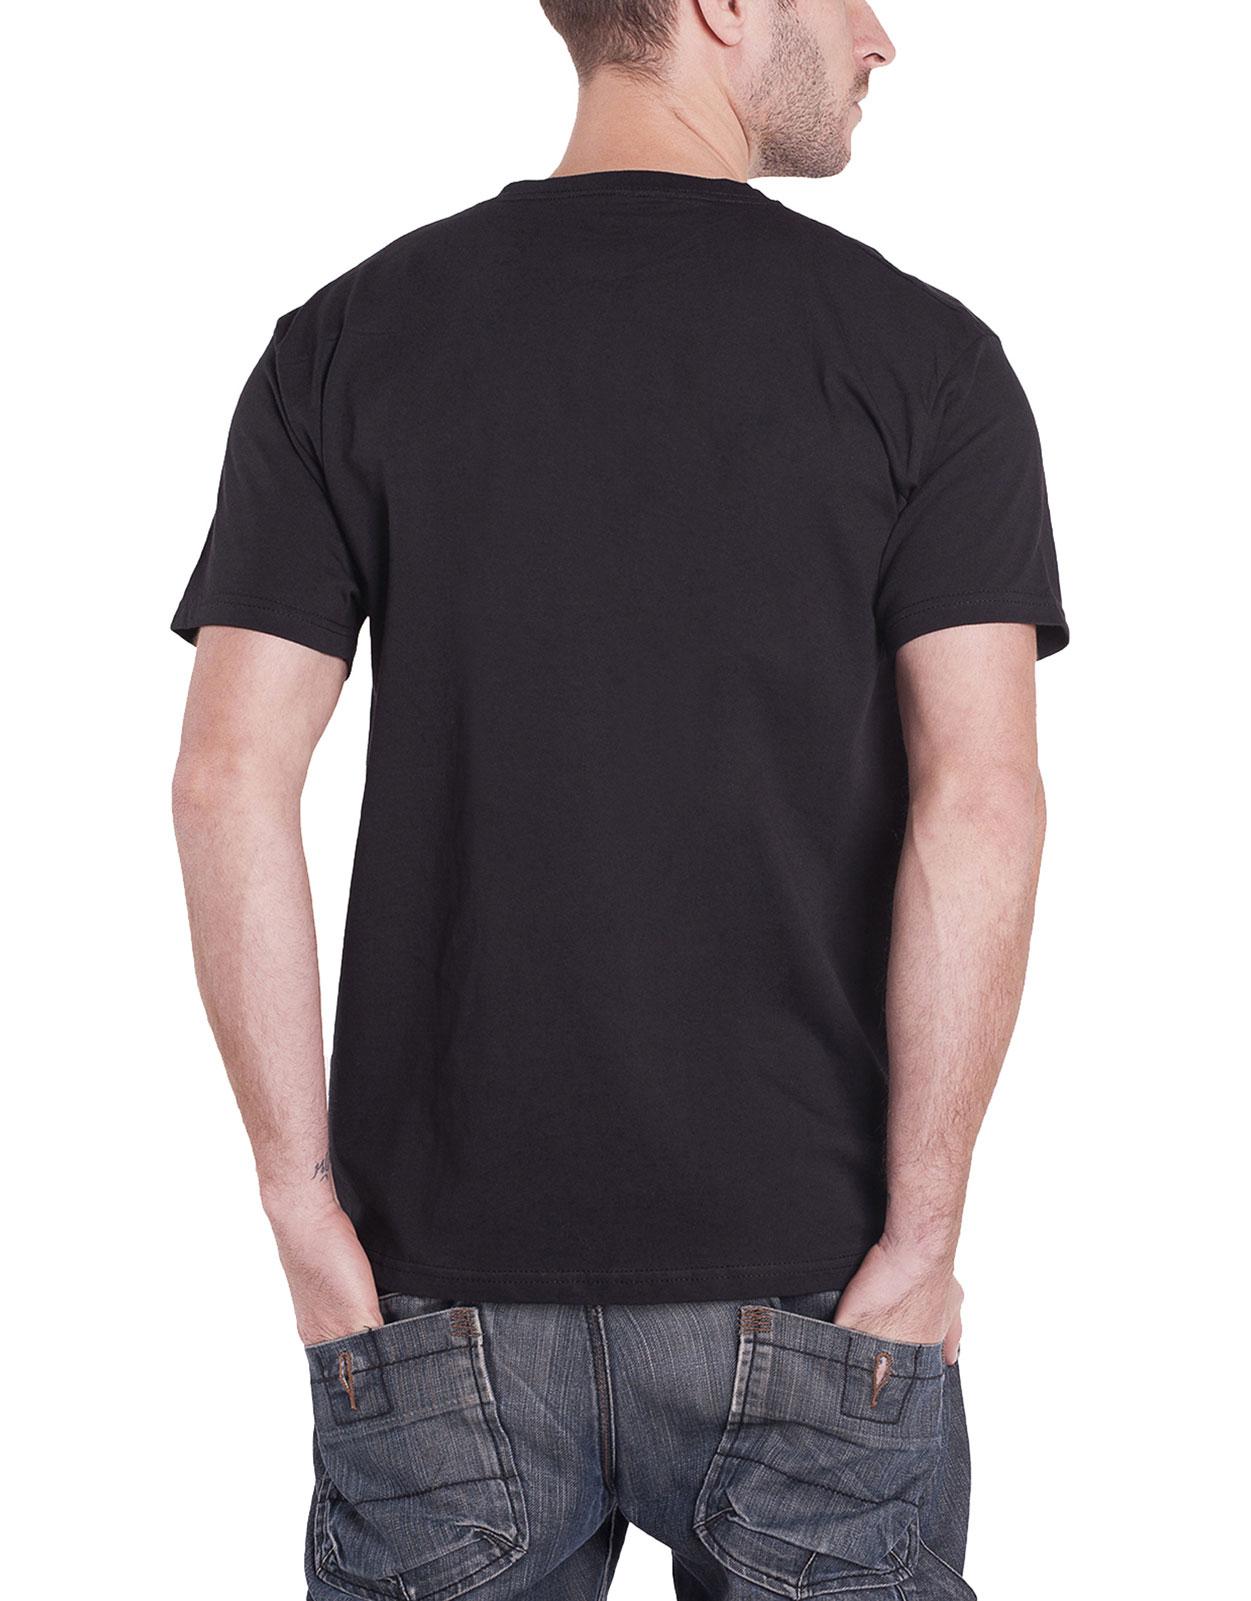 Camiseta-Last-Jedi-De-Star-Wars-Movie-Poster-porgs-Guardia-pretoriana-oficial-para-hombre miniatura 27